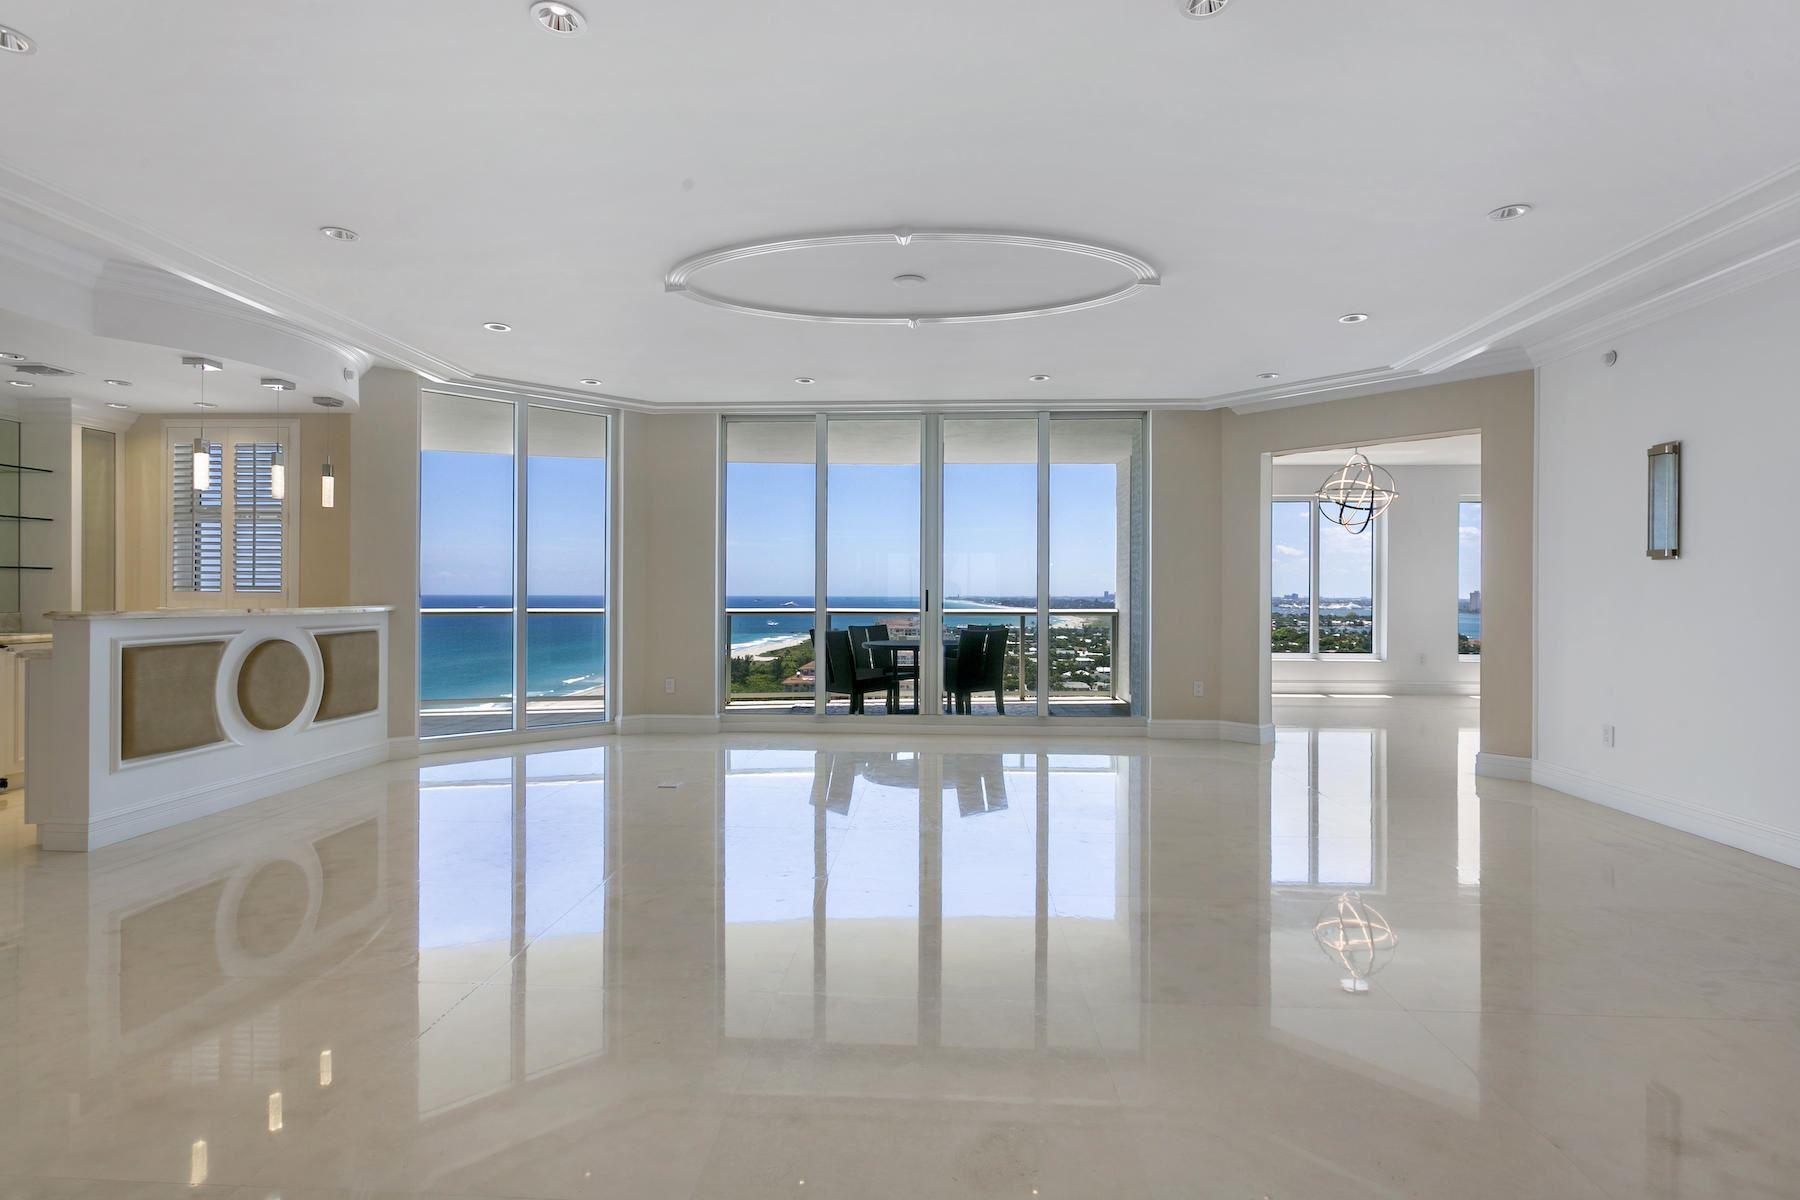 Photo of 2700 N Ocean Drive #1703a, Singer Island, FL 33404 (MLS # RX-10614979)